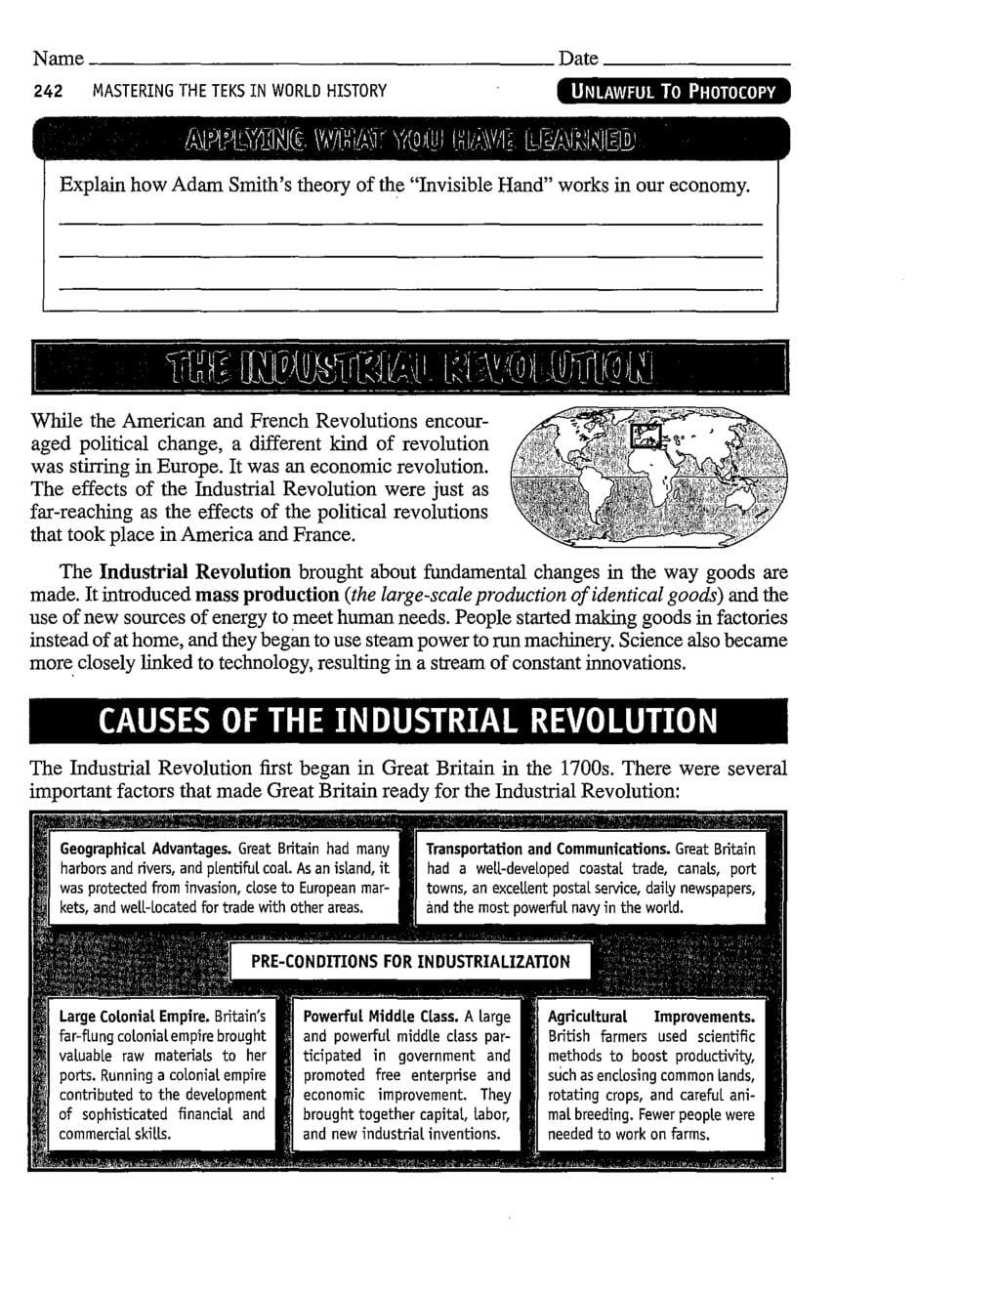 medium resolution of Industrial Revolution Printable Worksheet   Printable Worksheets and  Activities for Teachers